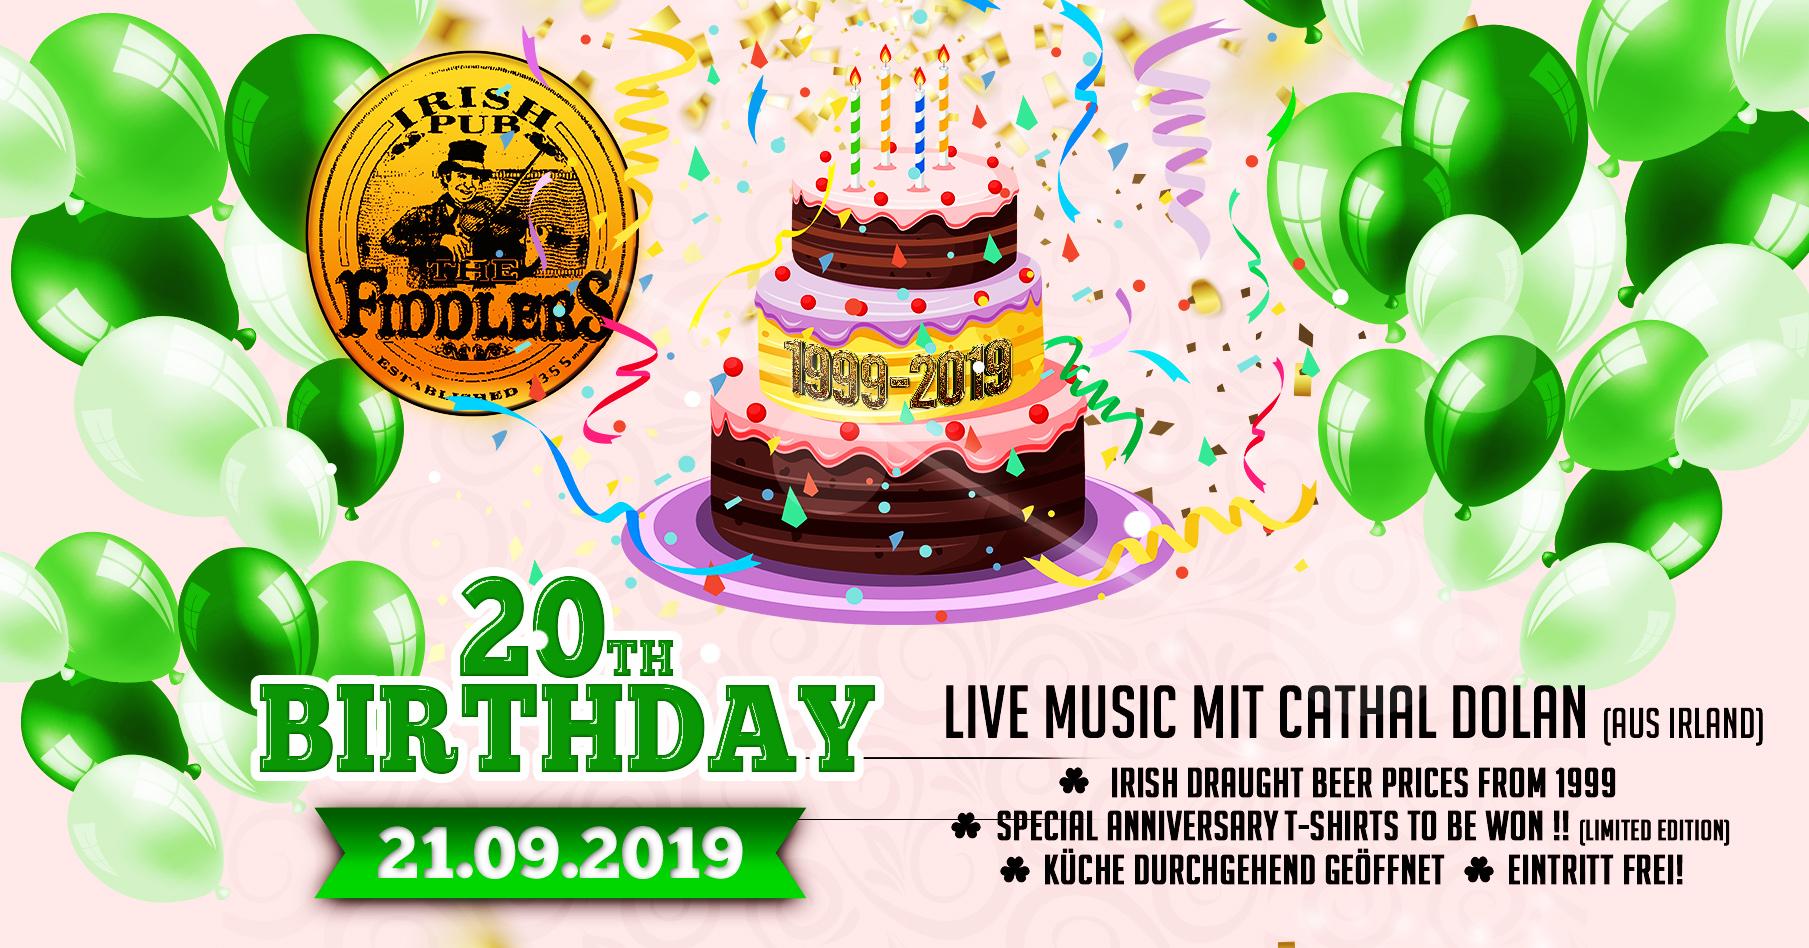 20th birthday-party